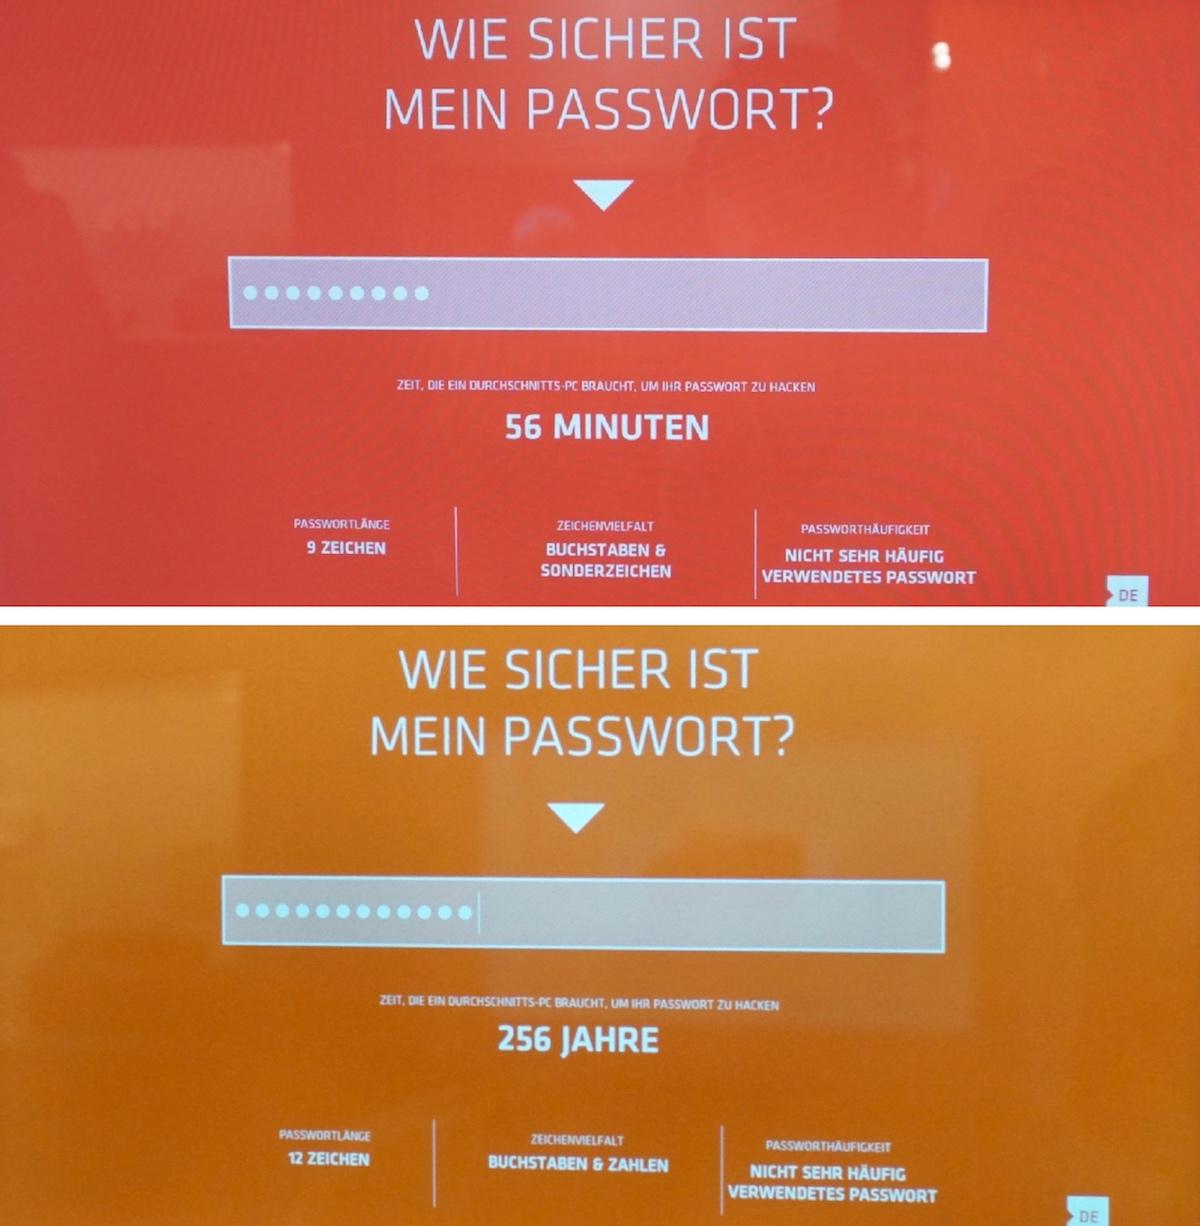 Deutsches Spionagemuseum, Passwort-Hacker